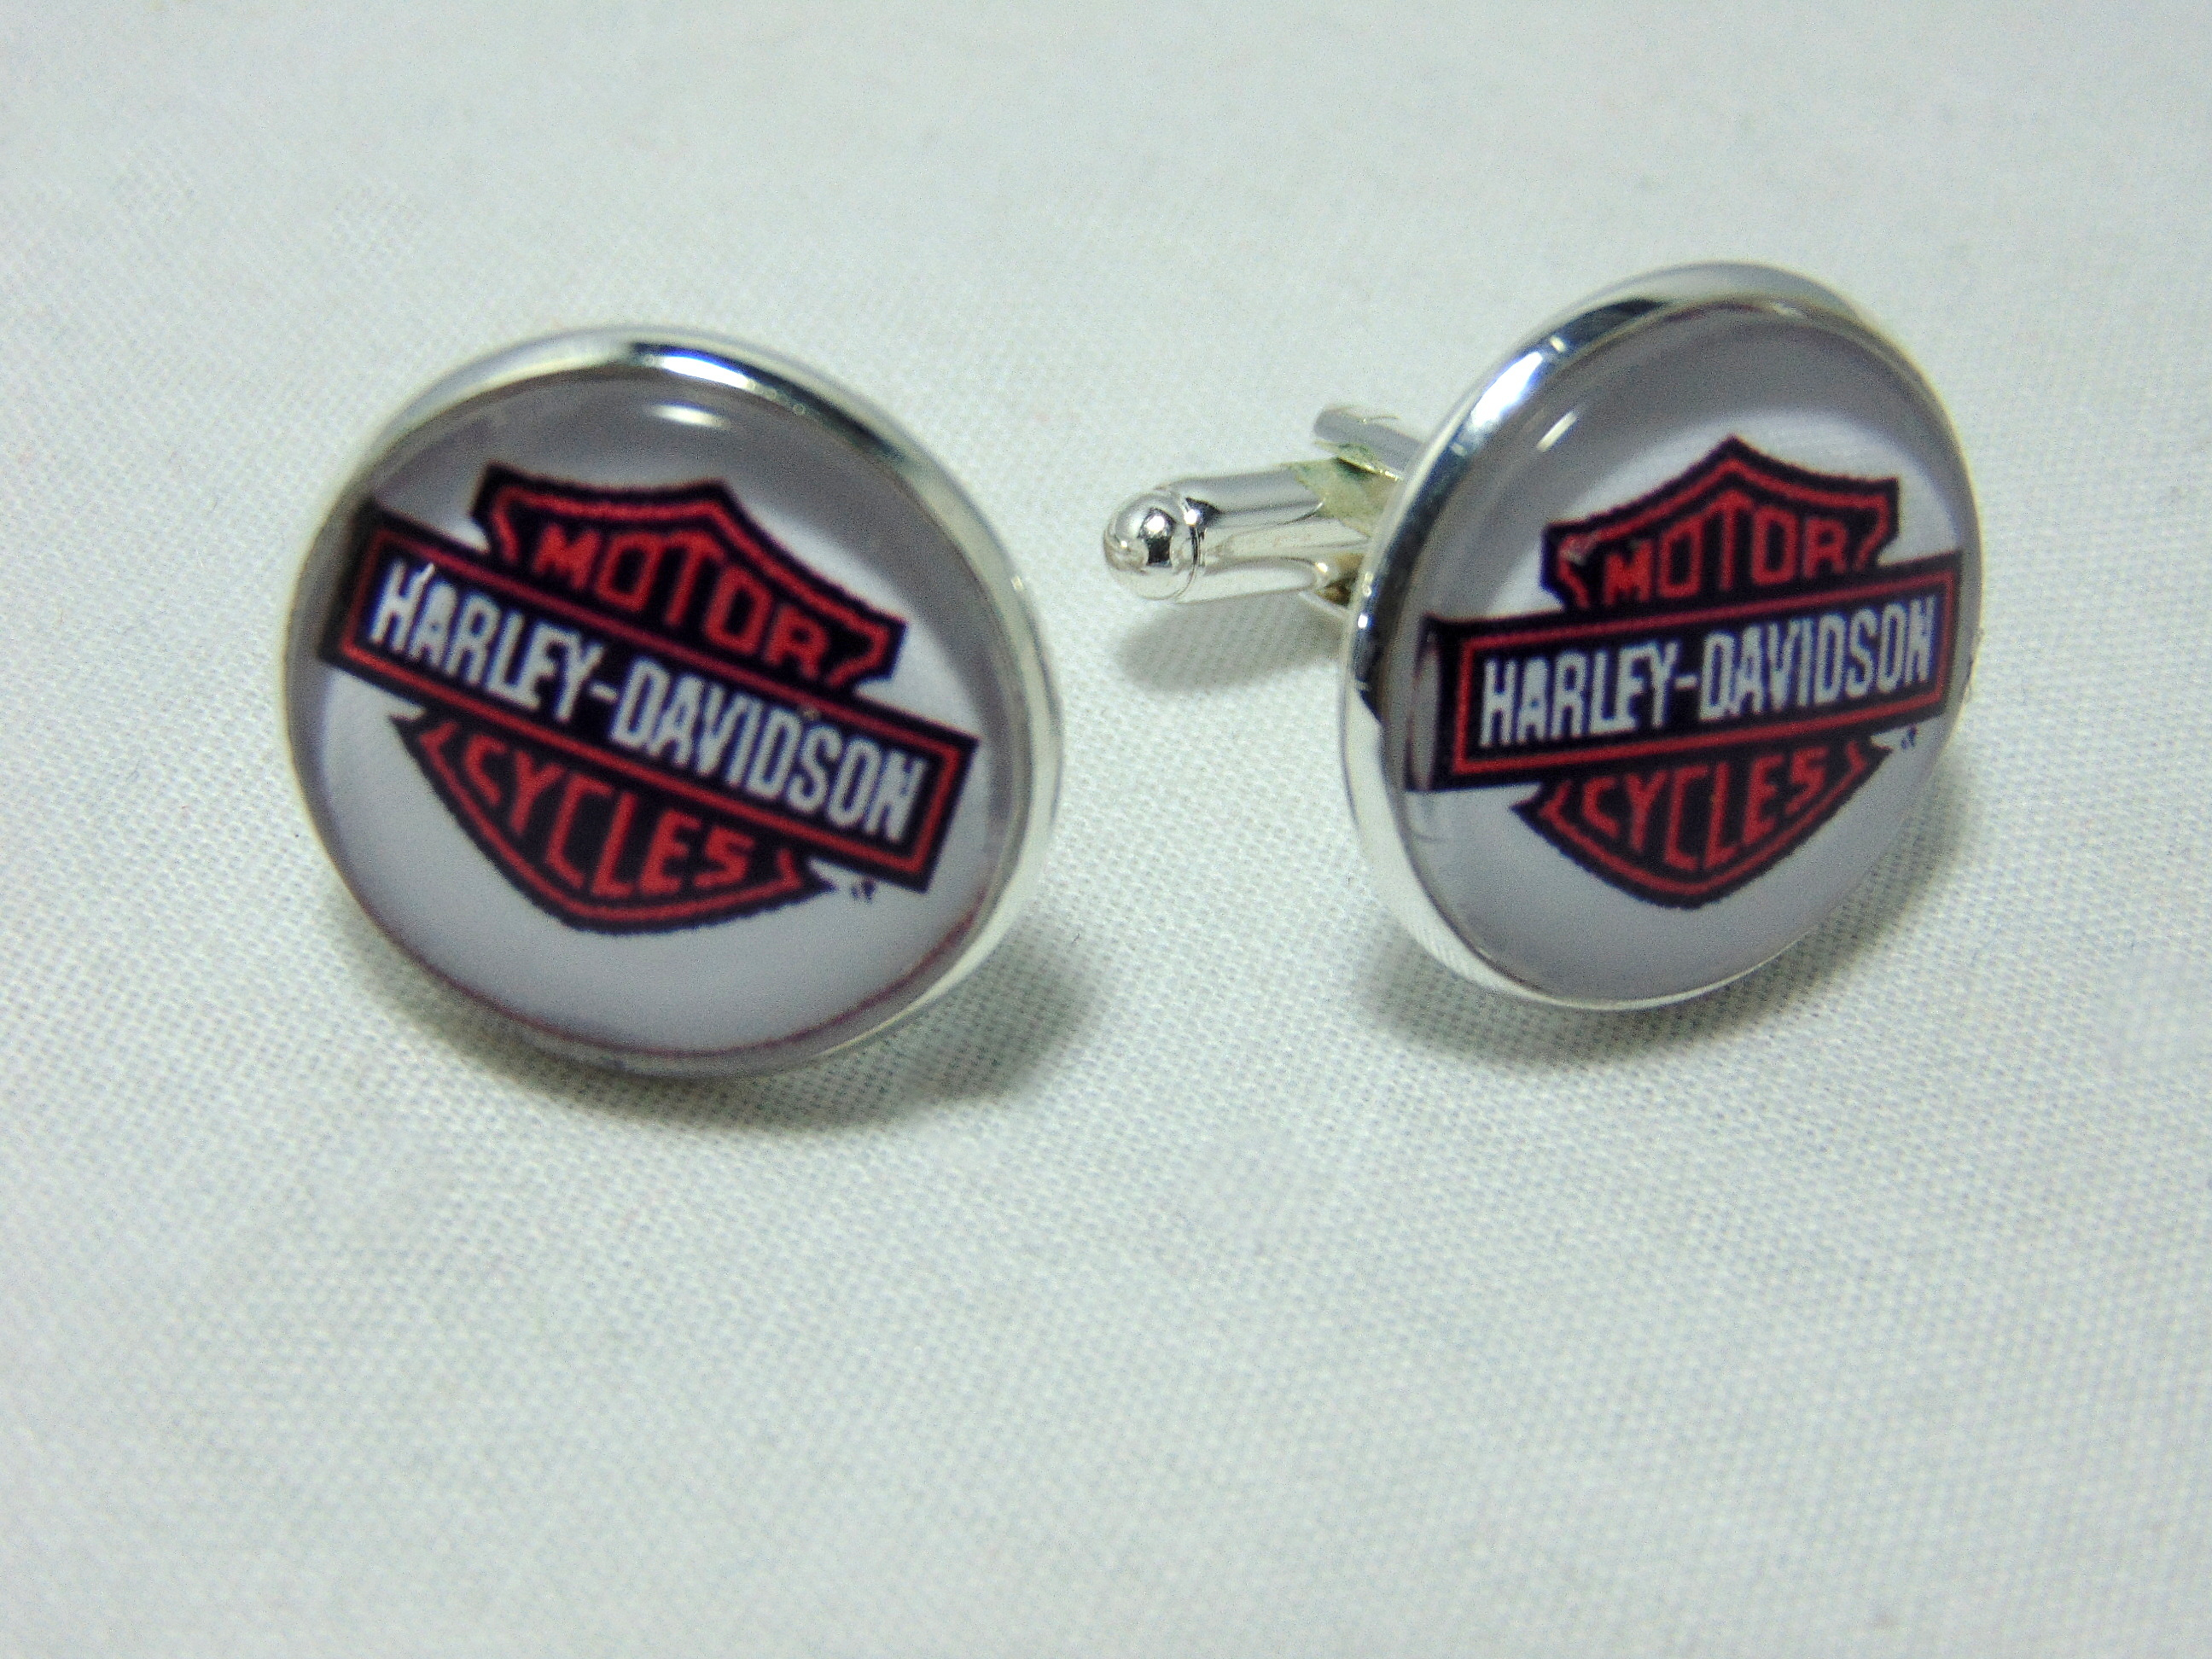 Harley Davidson Biker Silver Cufflinks.